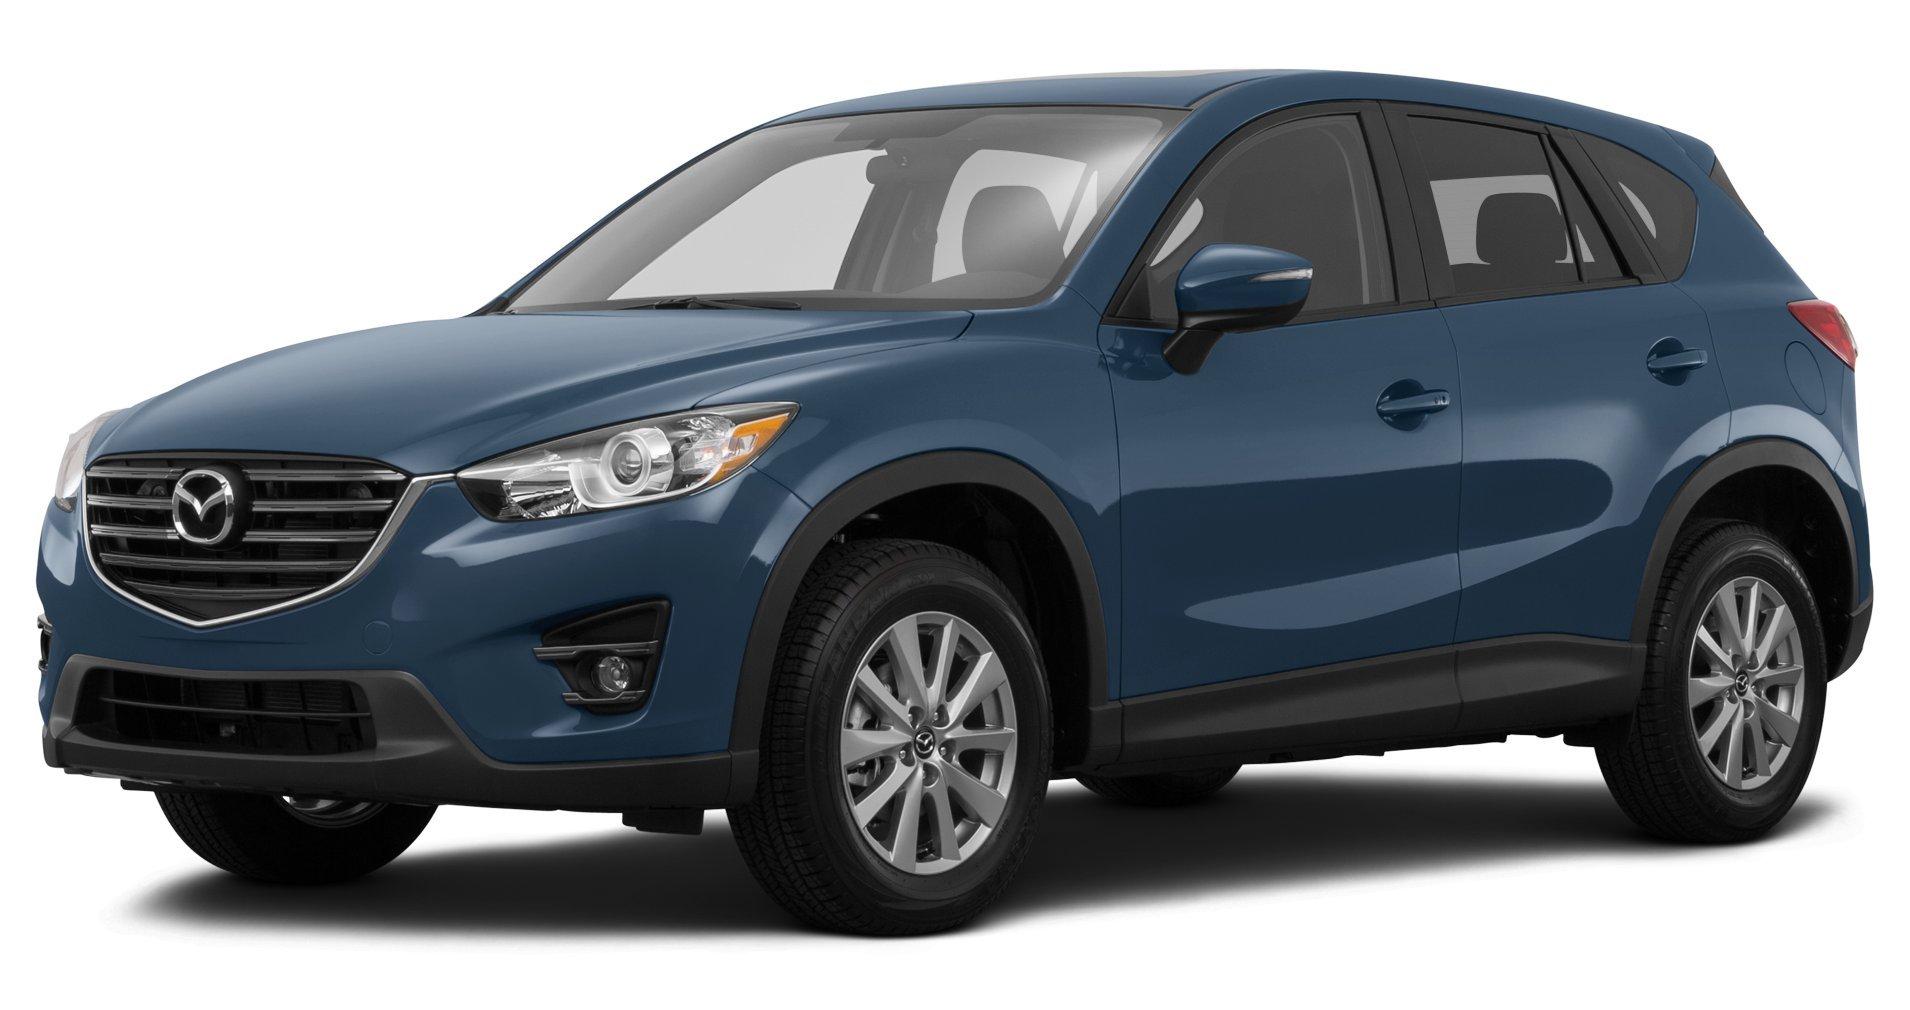 Amazon 2016 Mazda CX 3 Reviews and Specs Vehicles